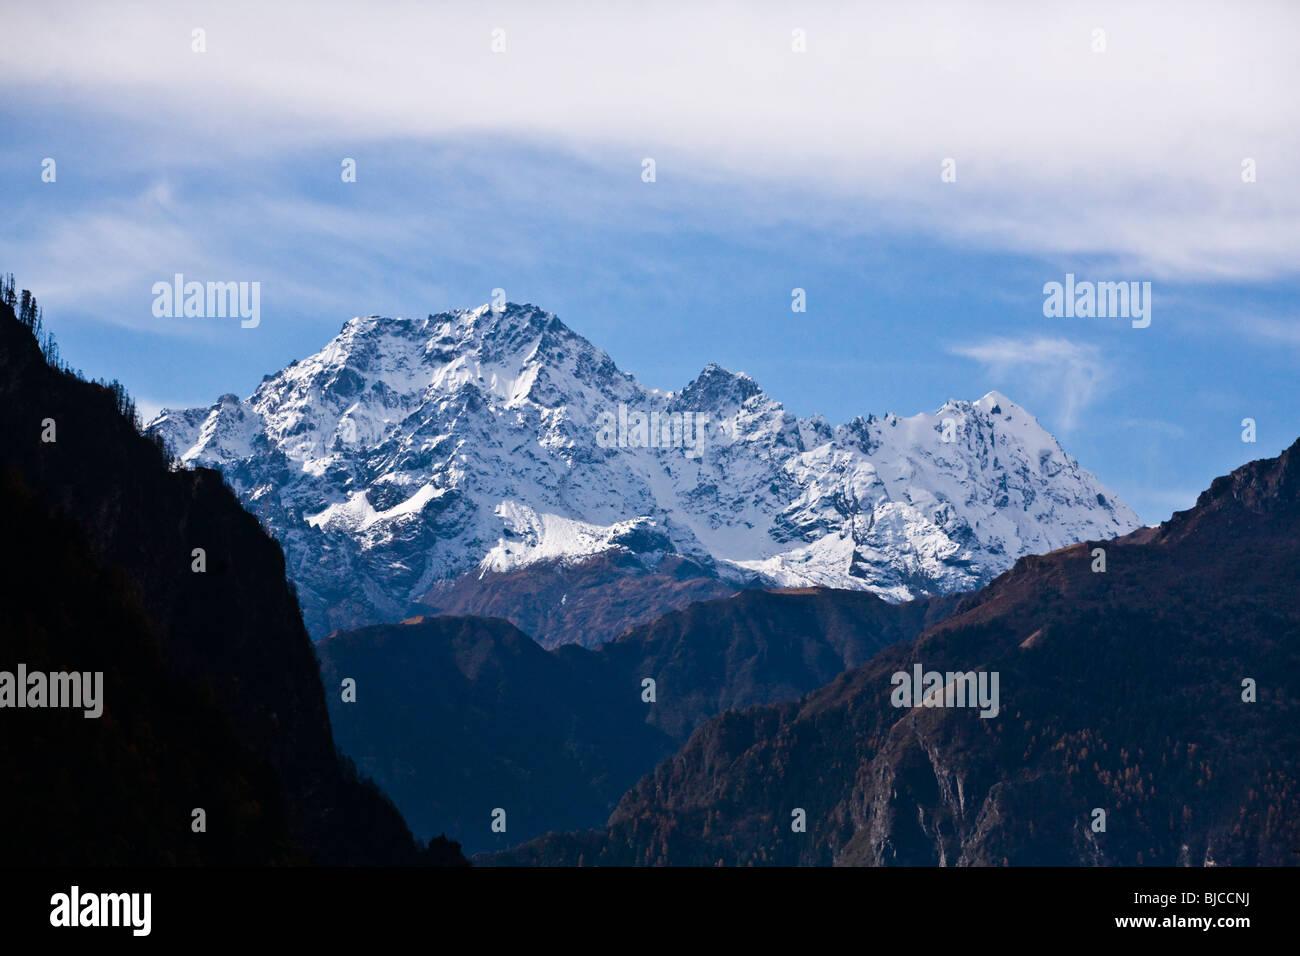 BODHA HIMAL as seen from NUPRI - AROUND MANASLU TREK, NEPAL - Stock Image